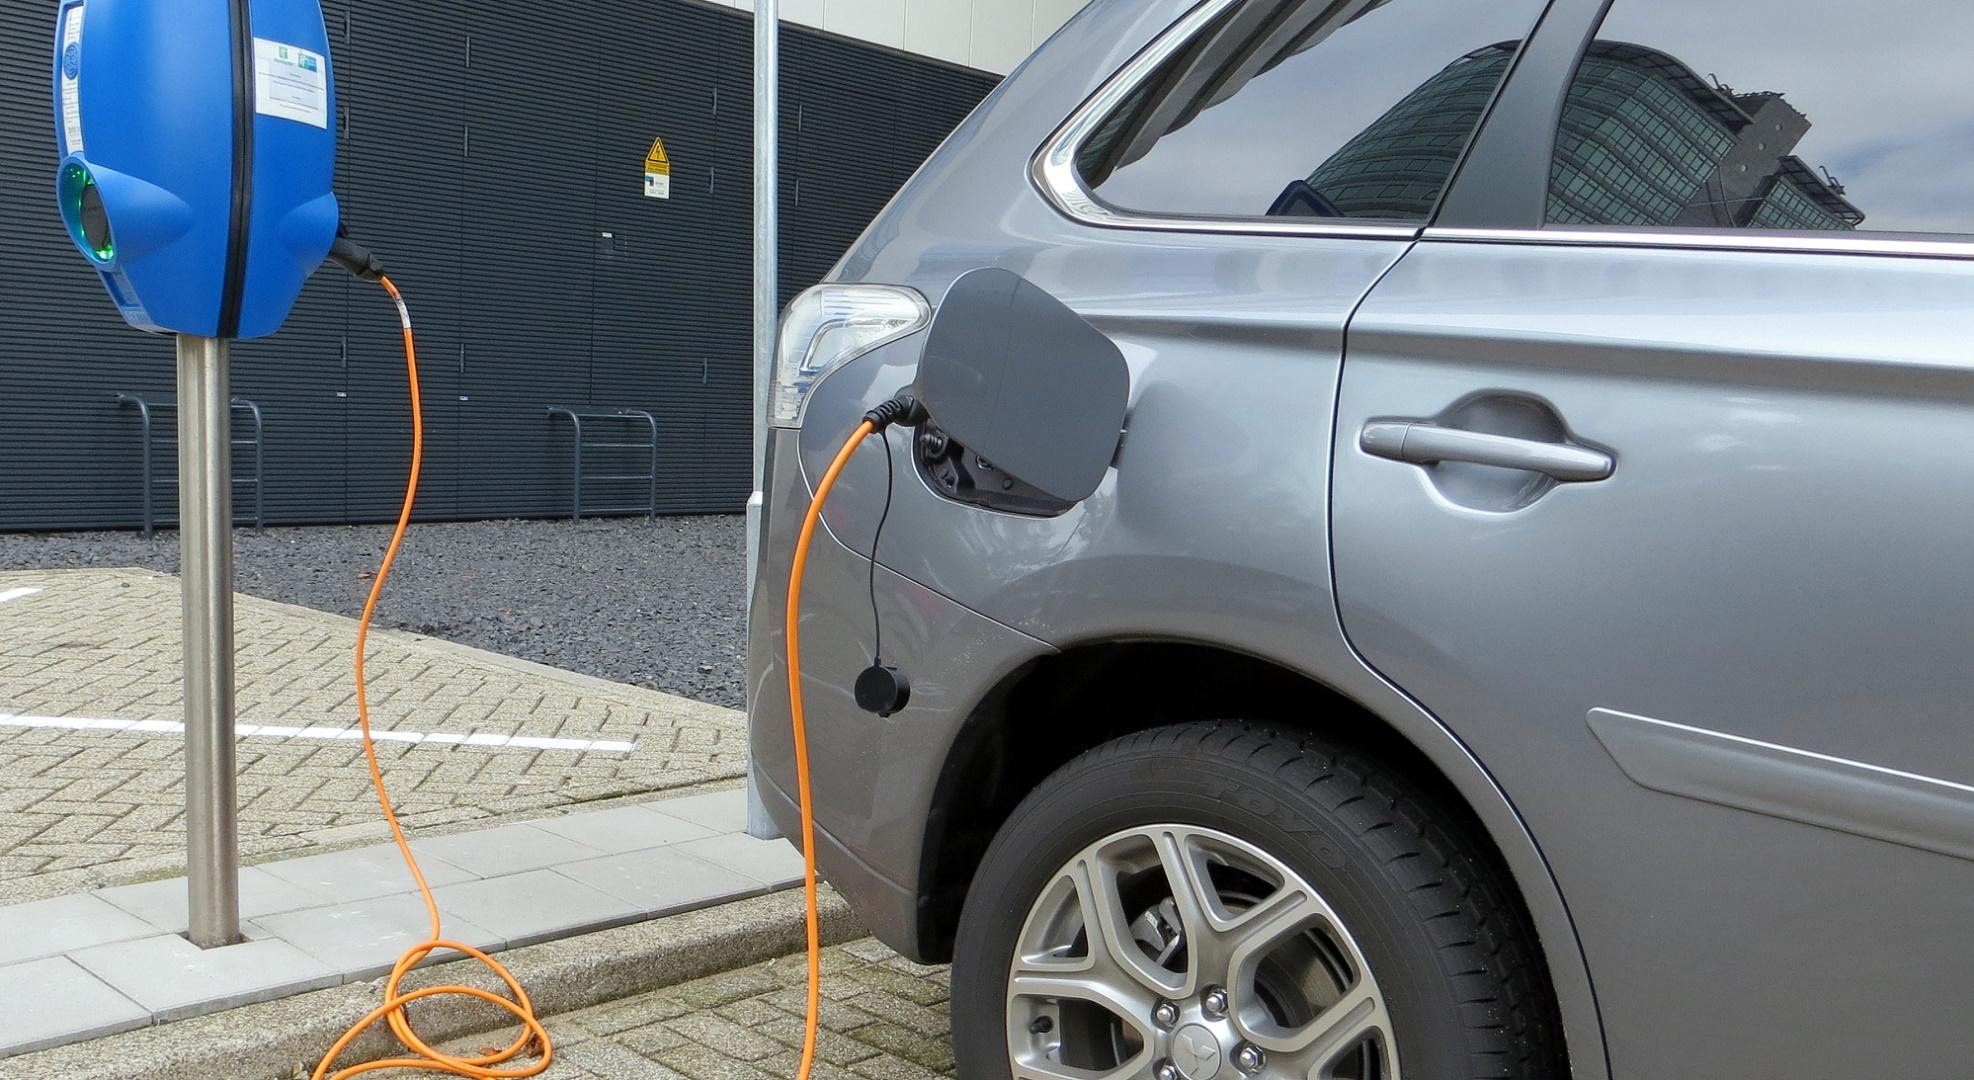 Las ventas de coches eléctricos suben un 49% en Europa